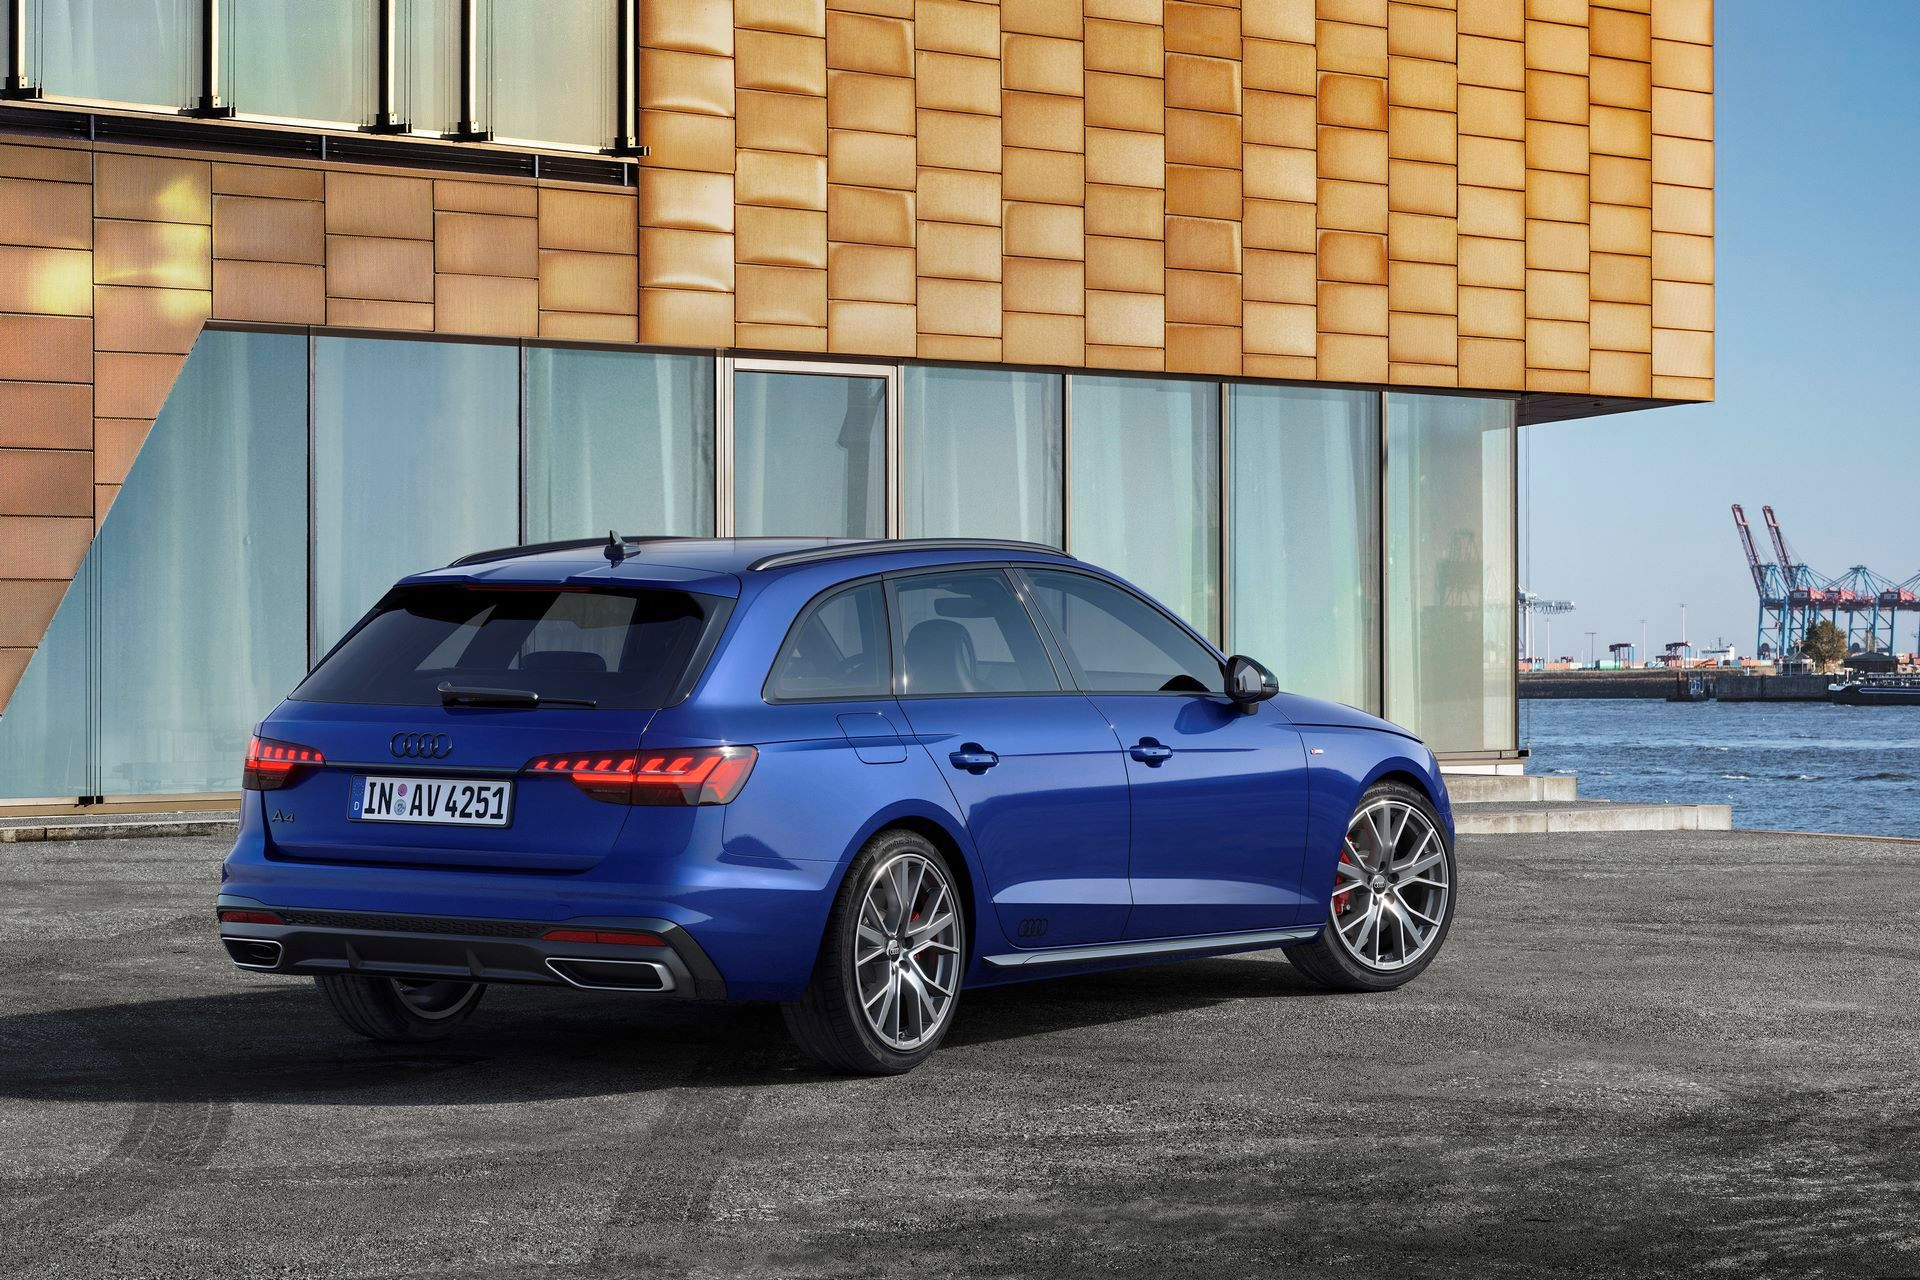 Audi-A4-A5-Q7-Q8-Competition-And-Competition-Plus-Trims-52